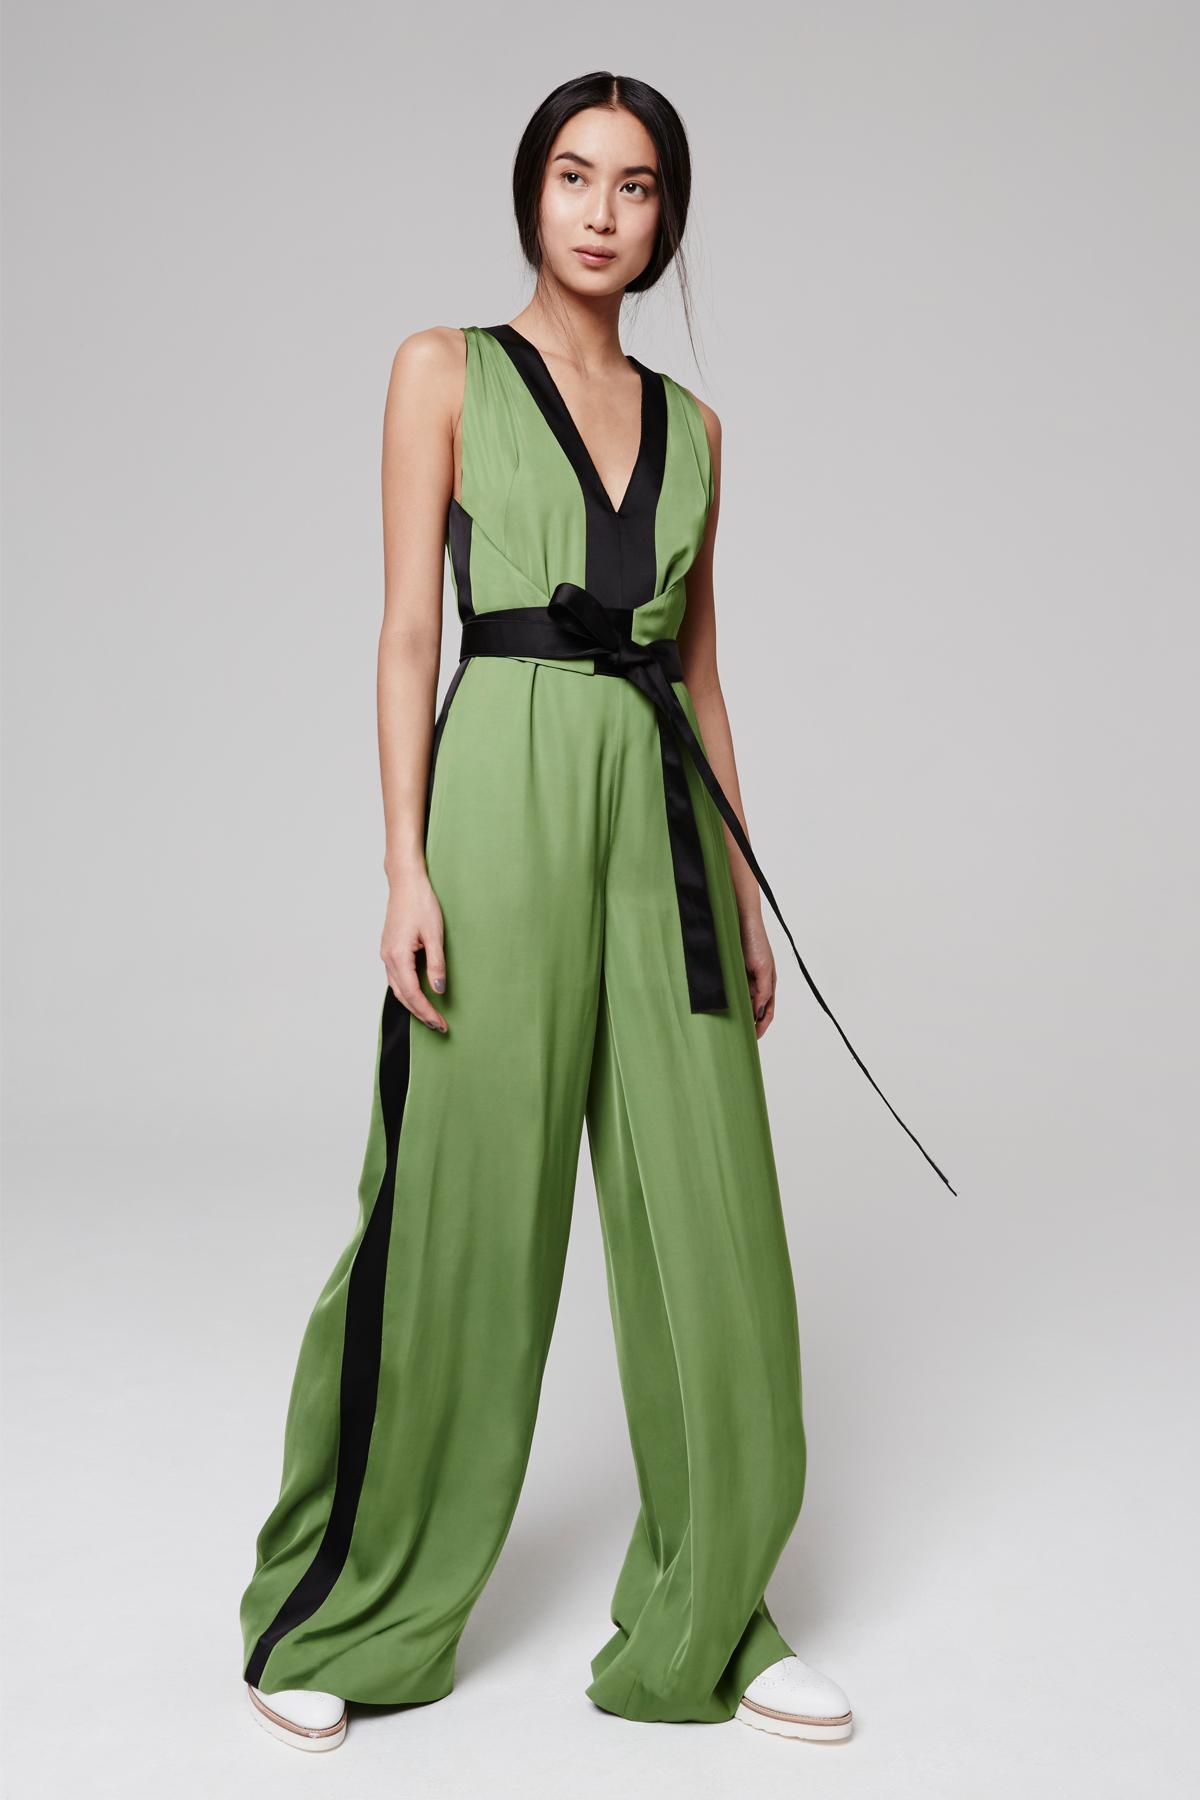 c8cb3eda8251 Amanda Wakeley Satin Bonsai Green   Black Jumpsuit in Green - Lyst